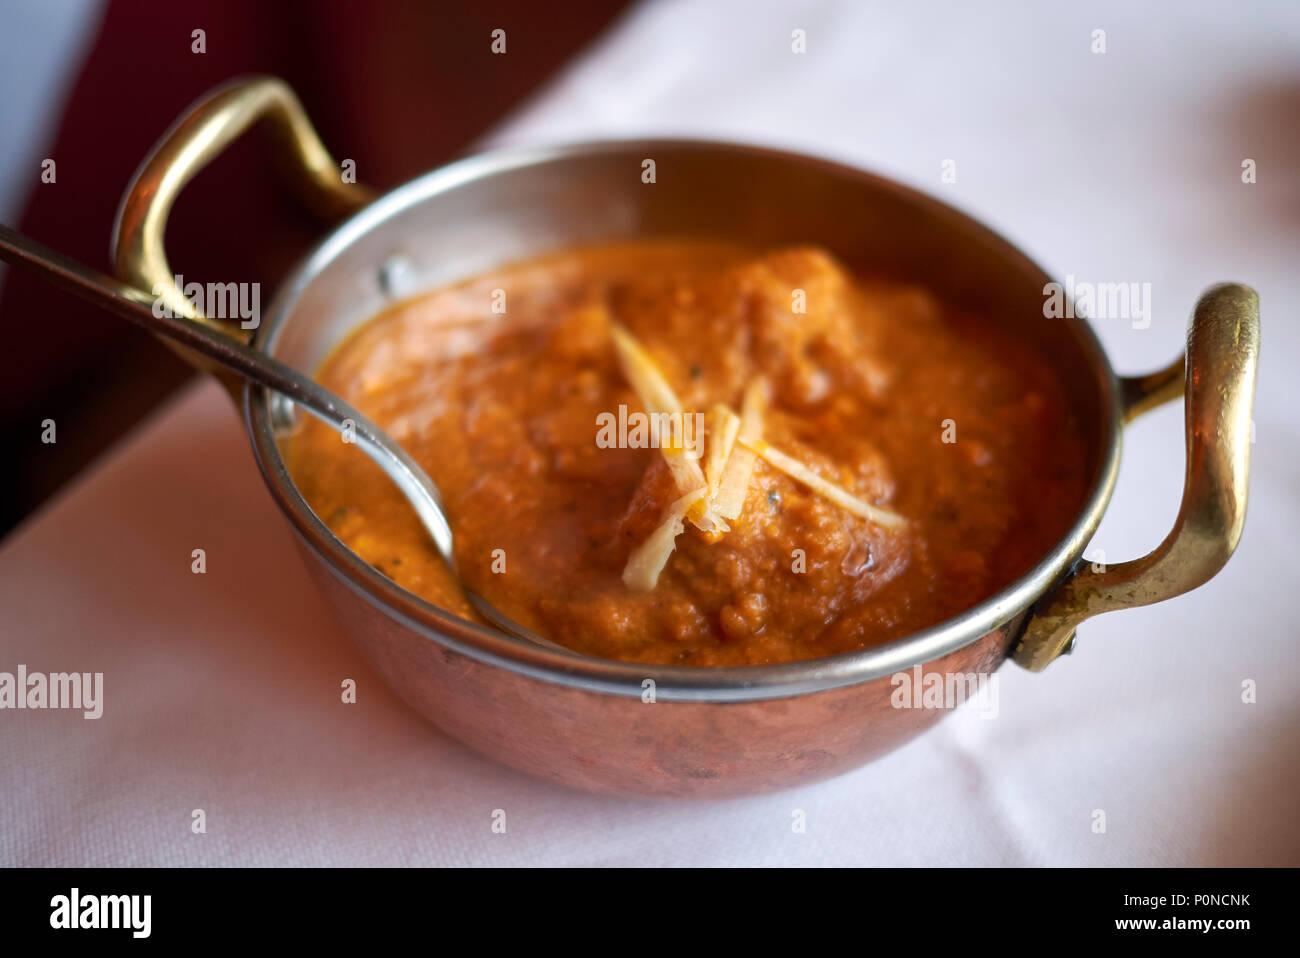 kashmiri dum aloo - Stock Image